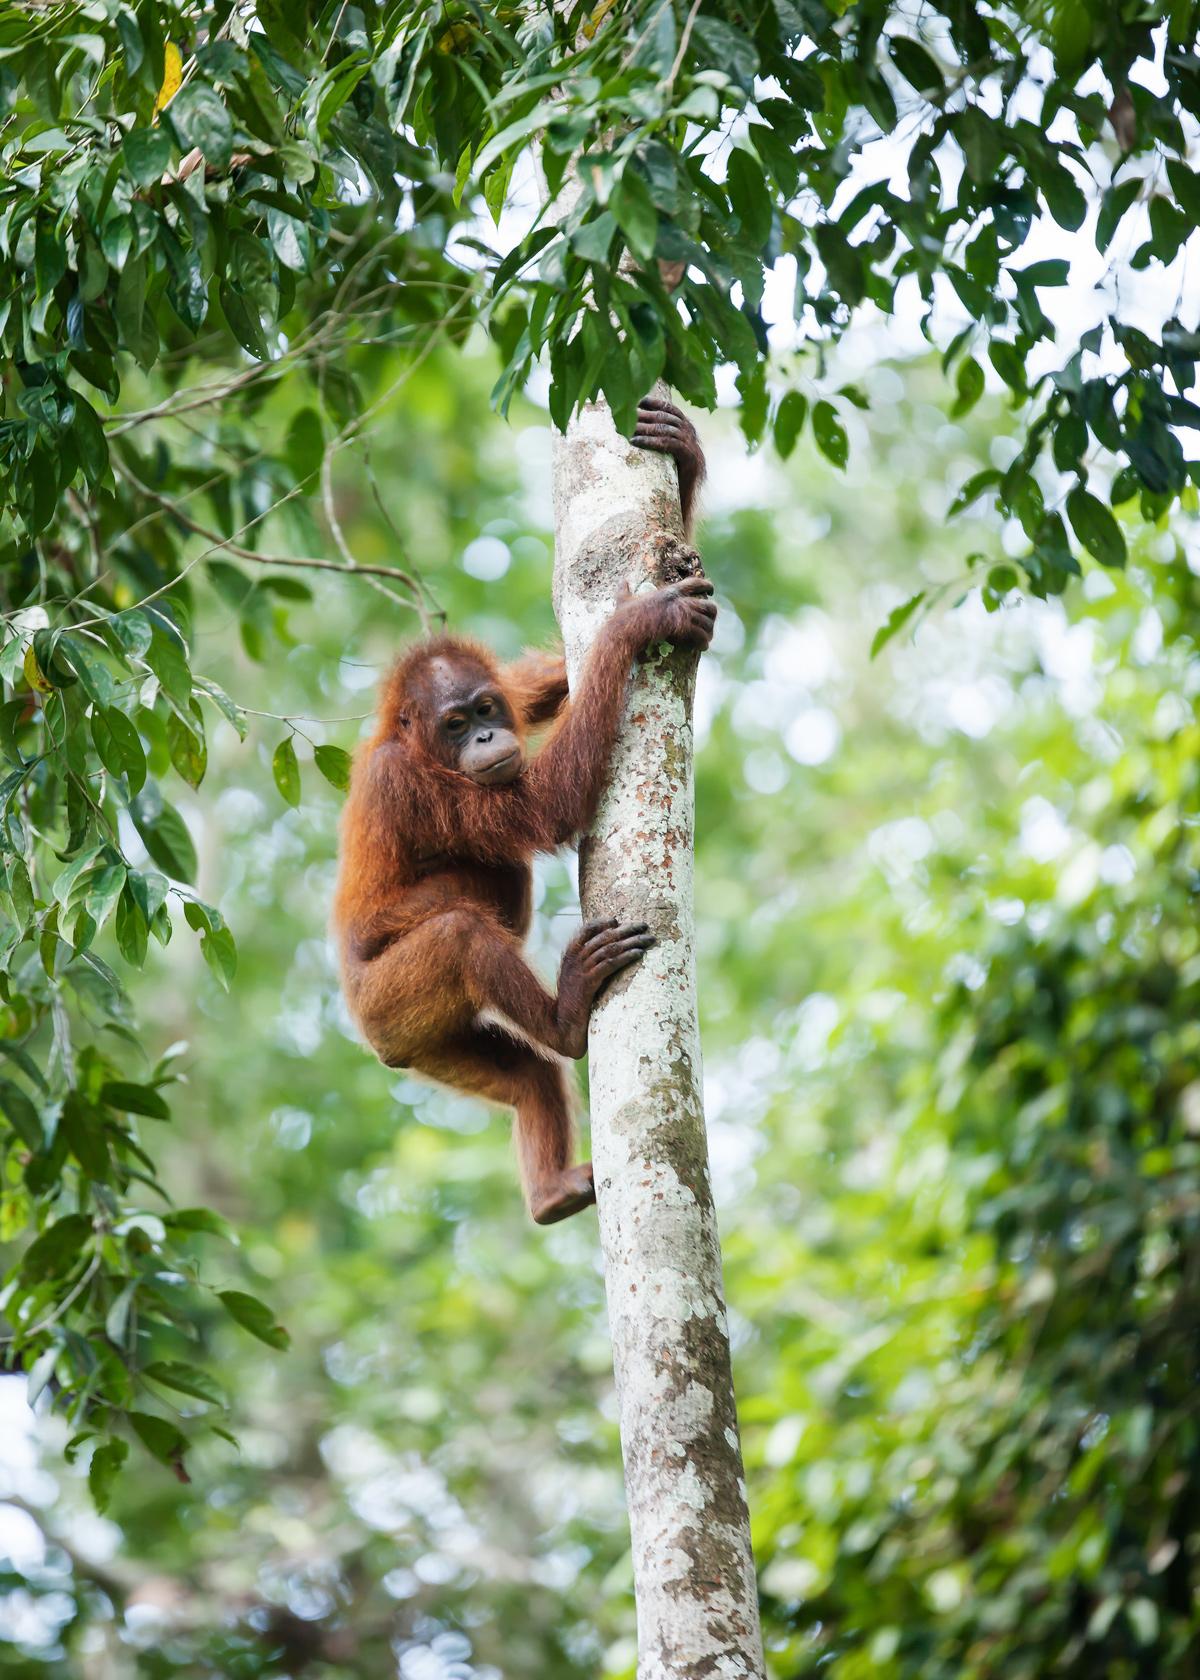 Orangutan-Edit.jpg